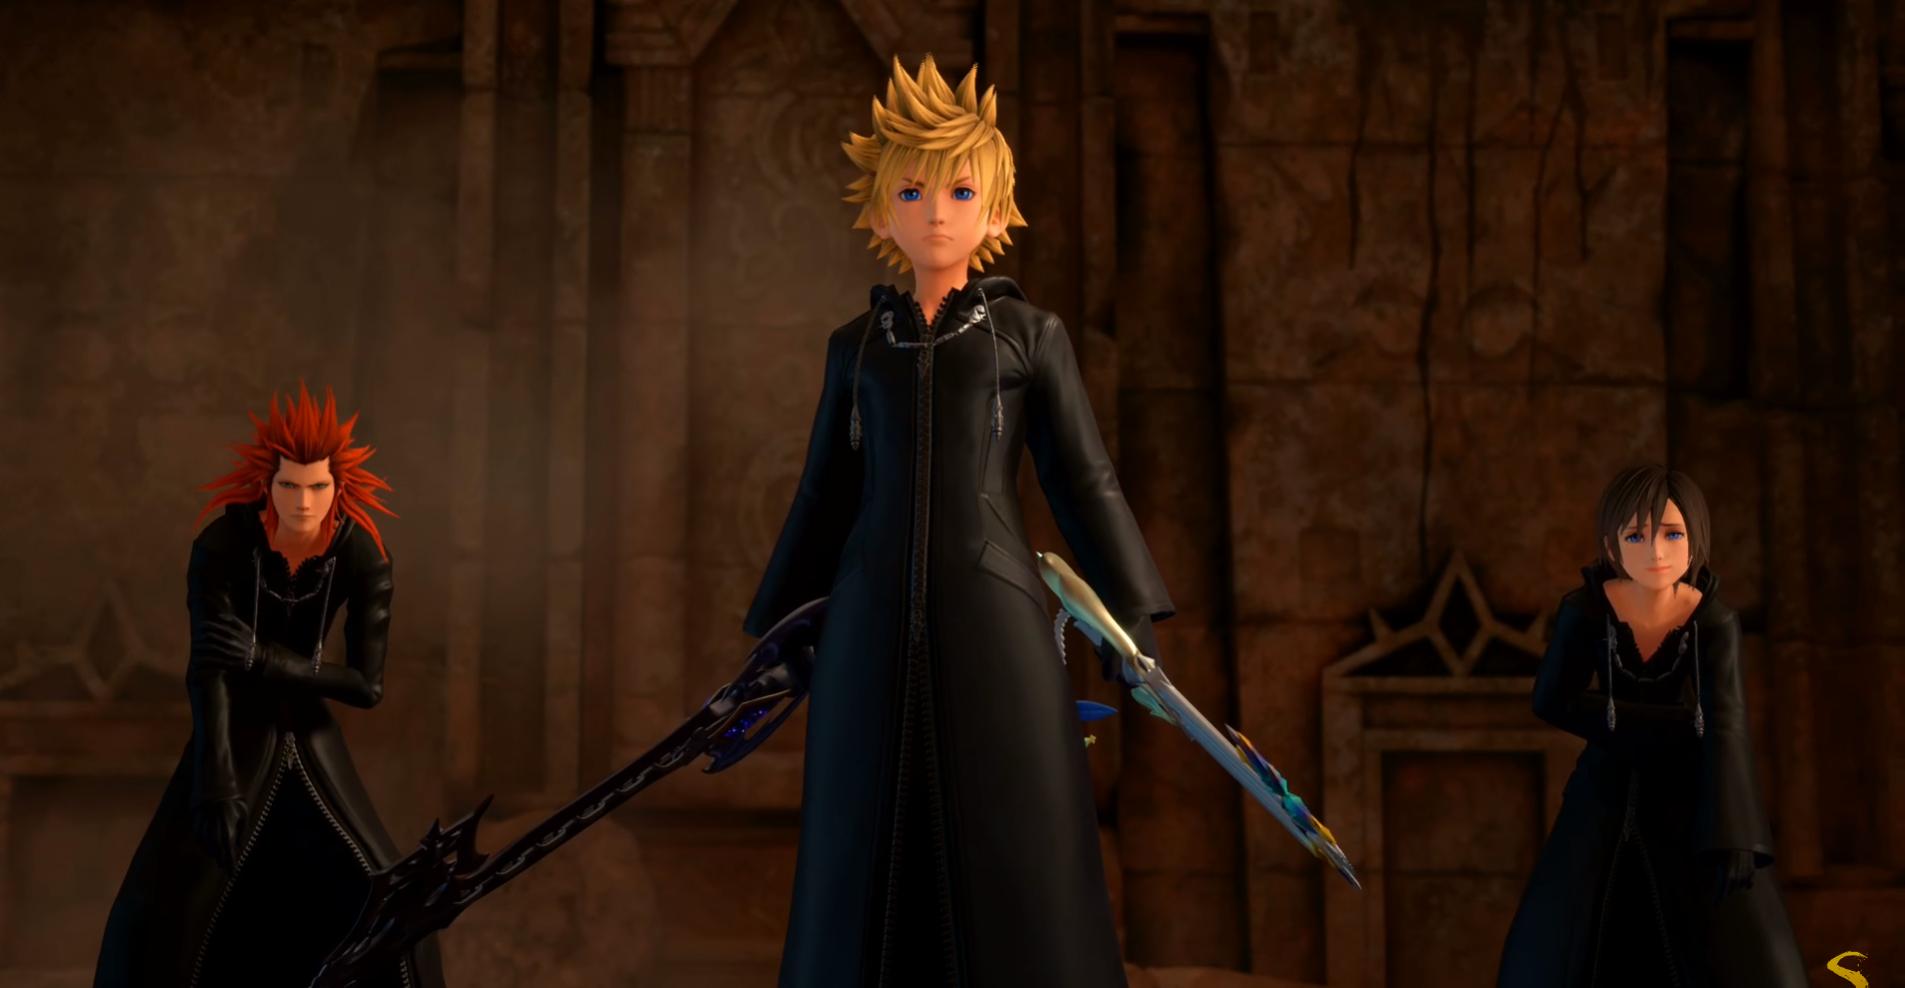 Kingdom Hearts 3 DLC Trailer Confirms Dual-Keyblade-Wielding Roxas